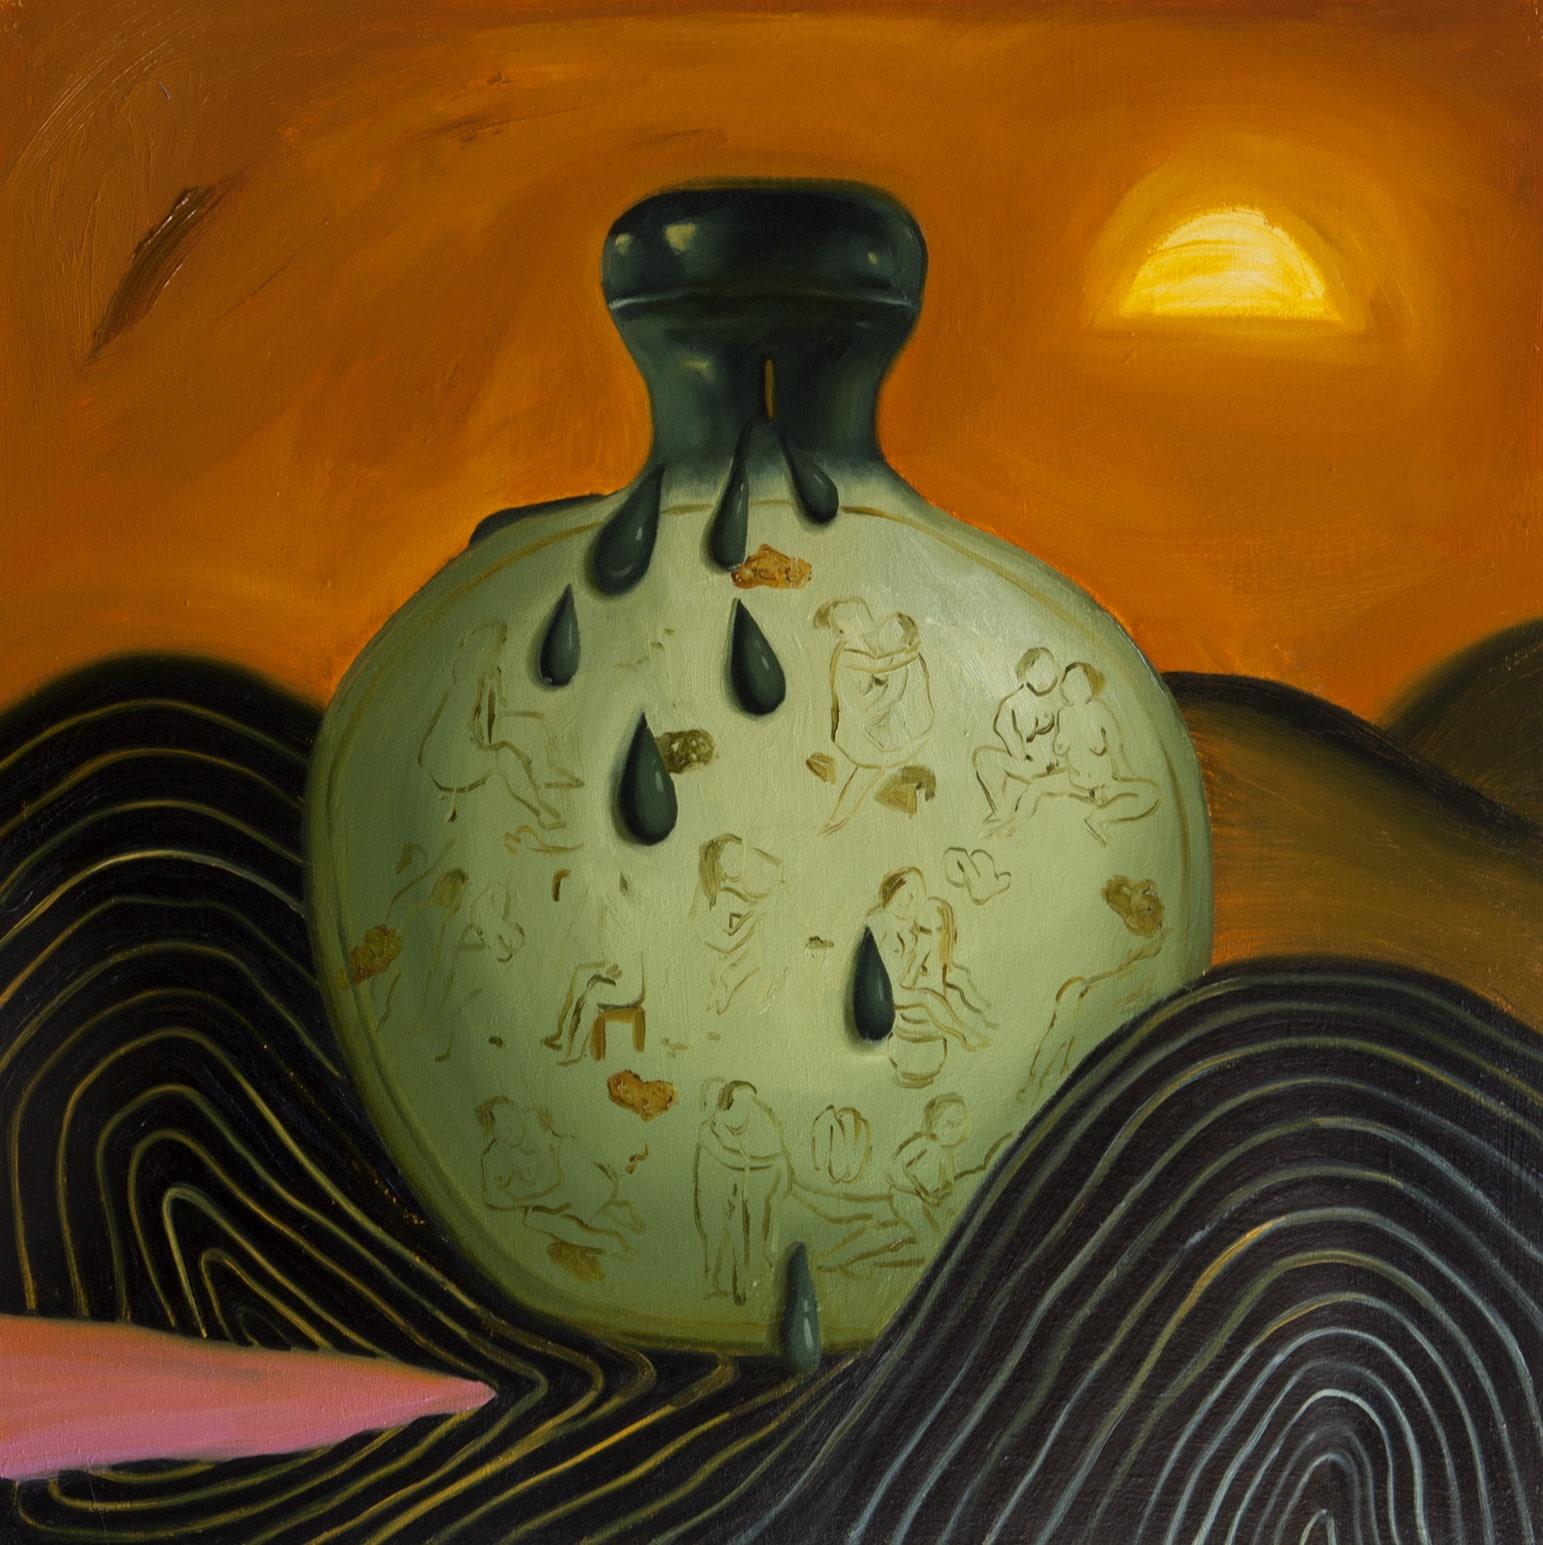 Dominique Fung Lewd, 2019 Oil on linen 76.2 cm x76.2 cm 30 x 30 in.